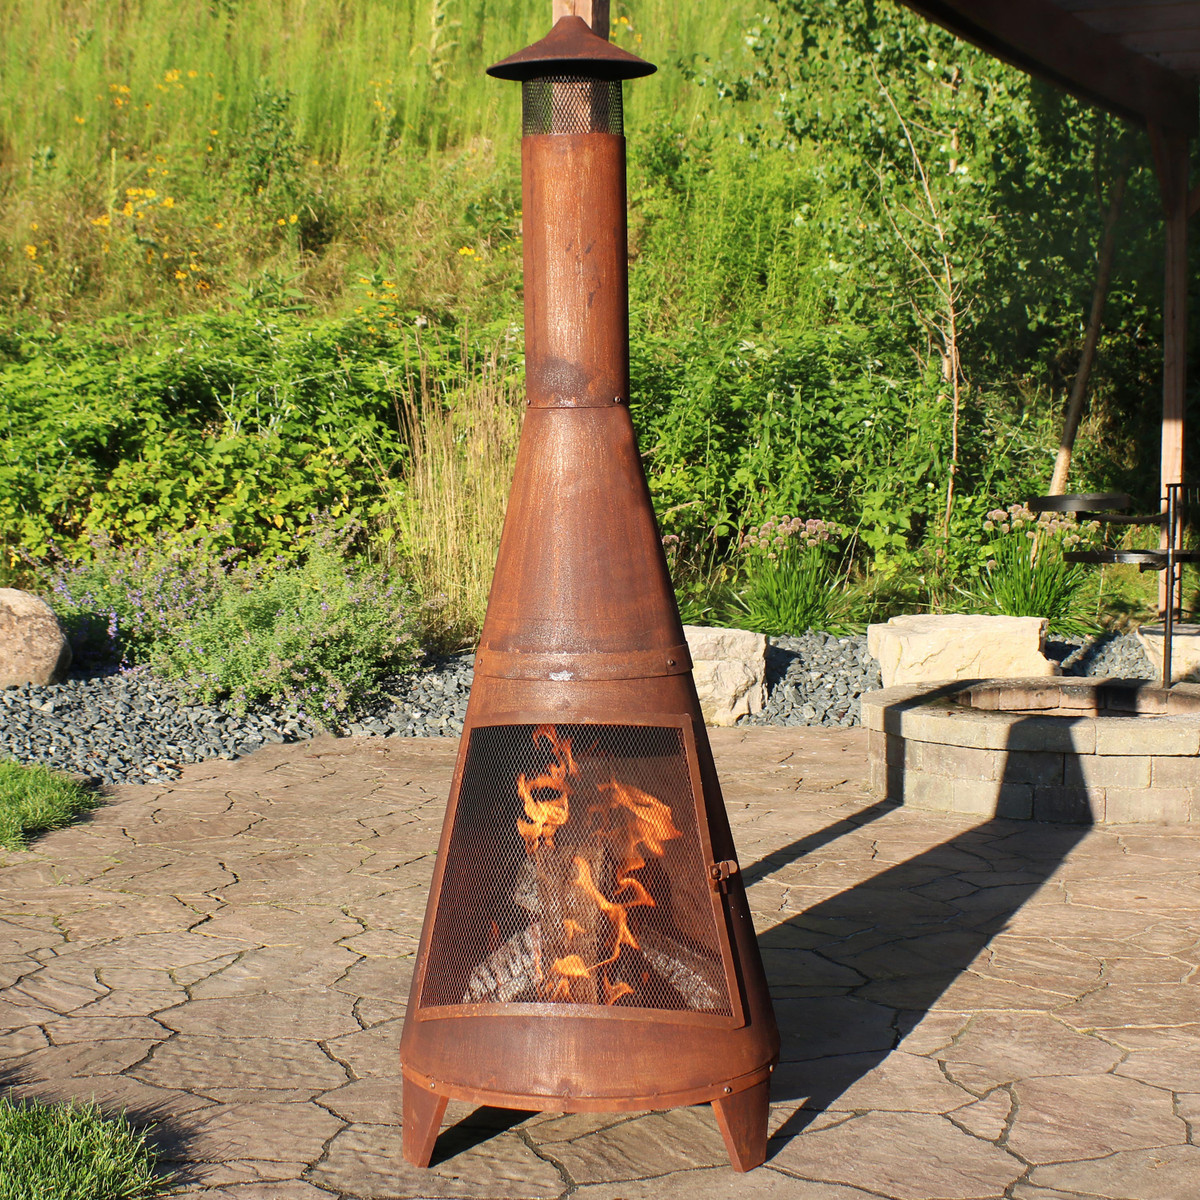 Sunnydaze Rustic Outdoor Wood Burning Backyard Chiminea Fire Pit